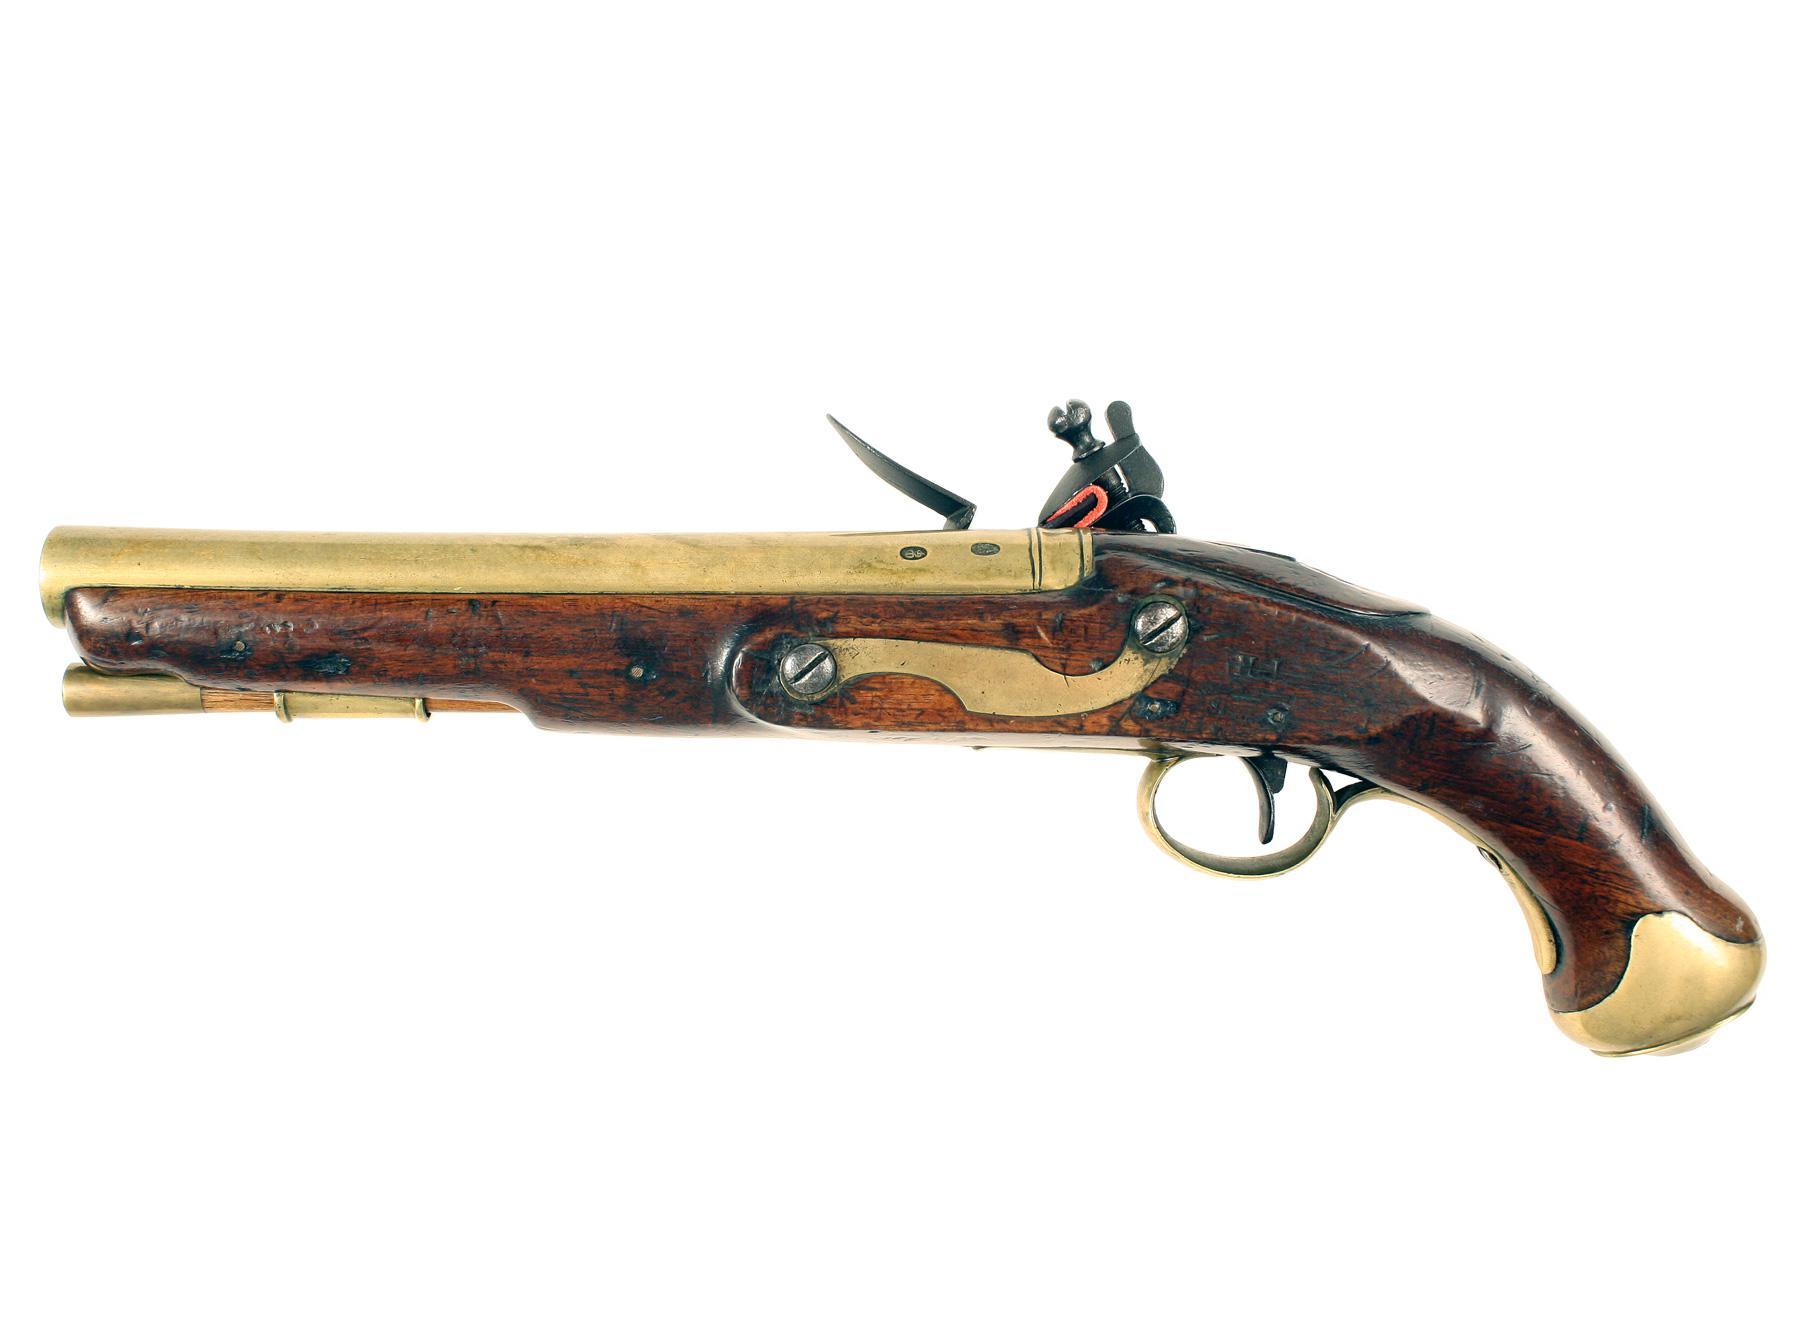 A Rare Packet Ship Pistol